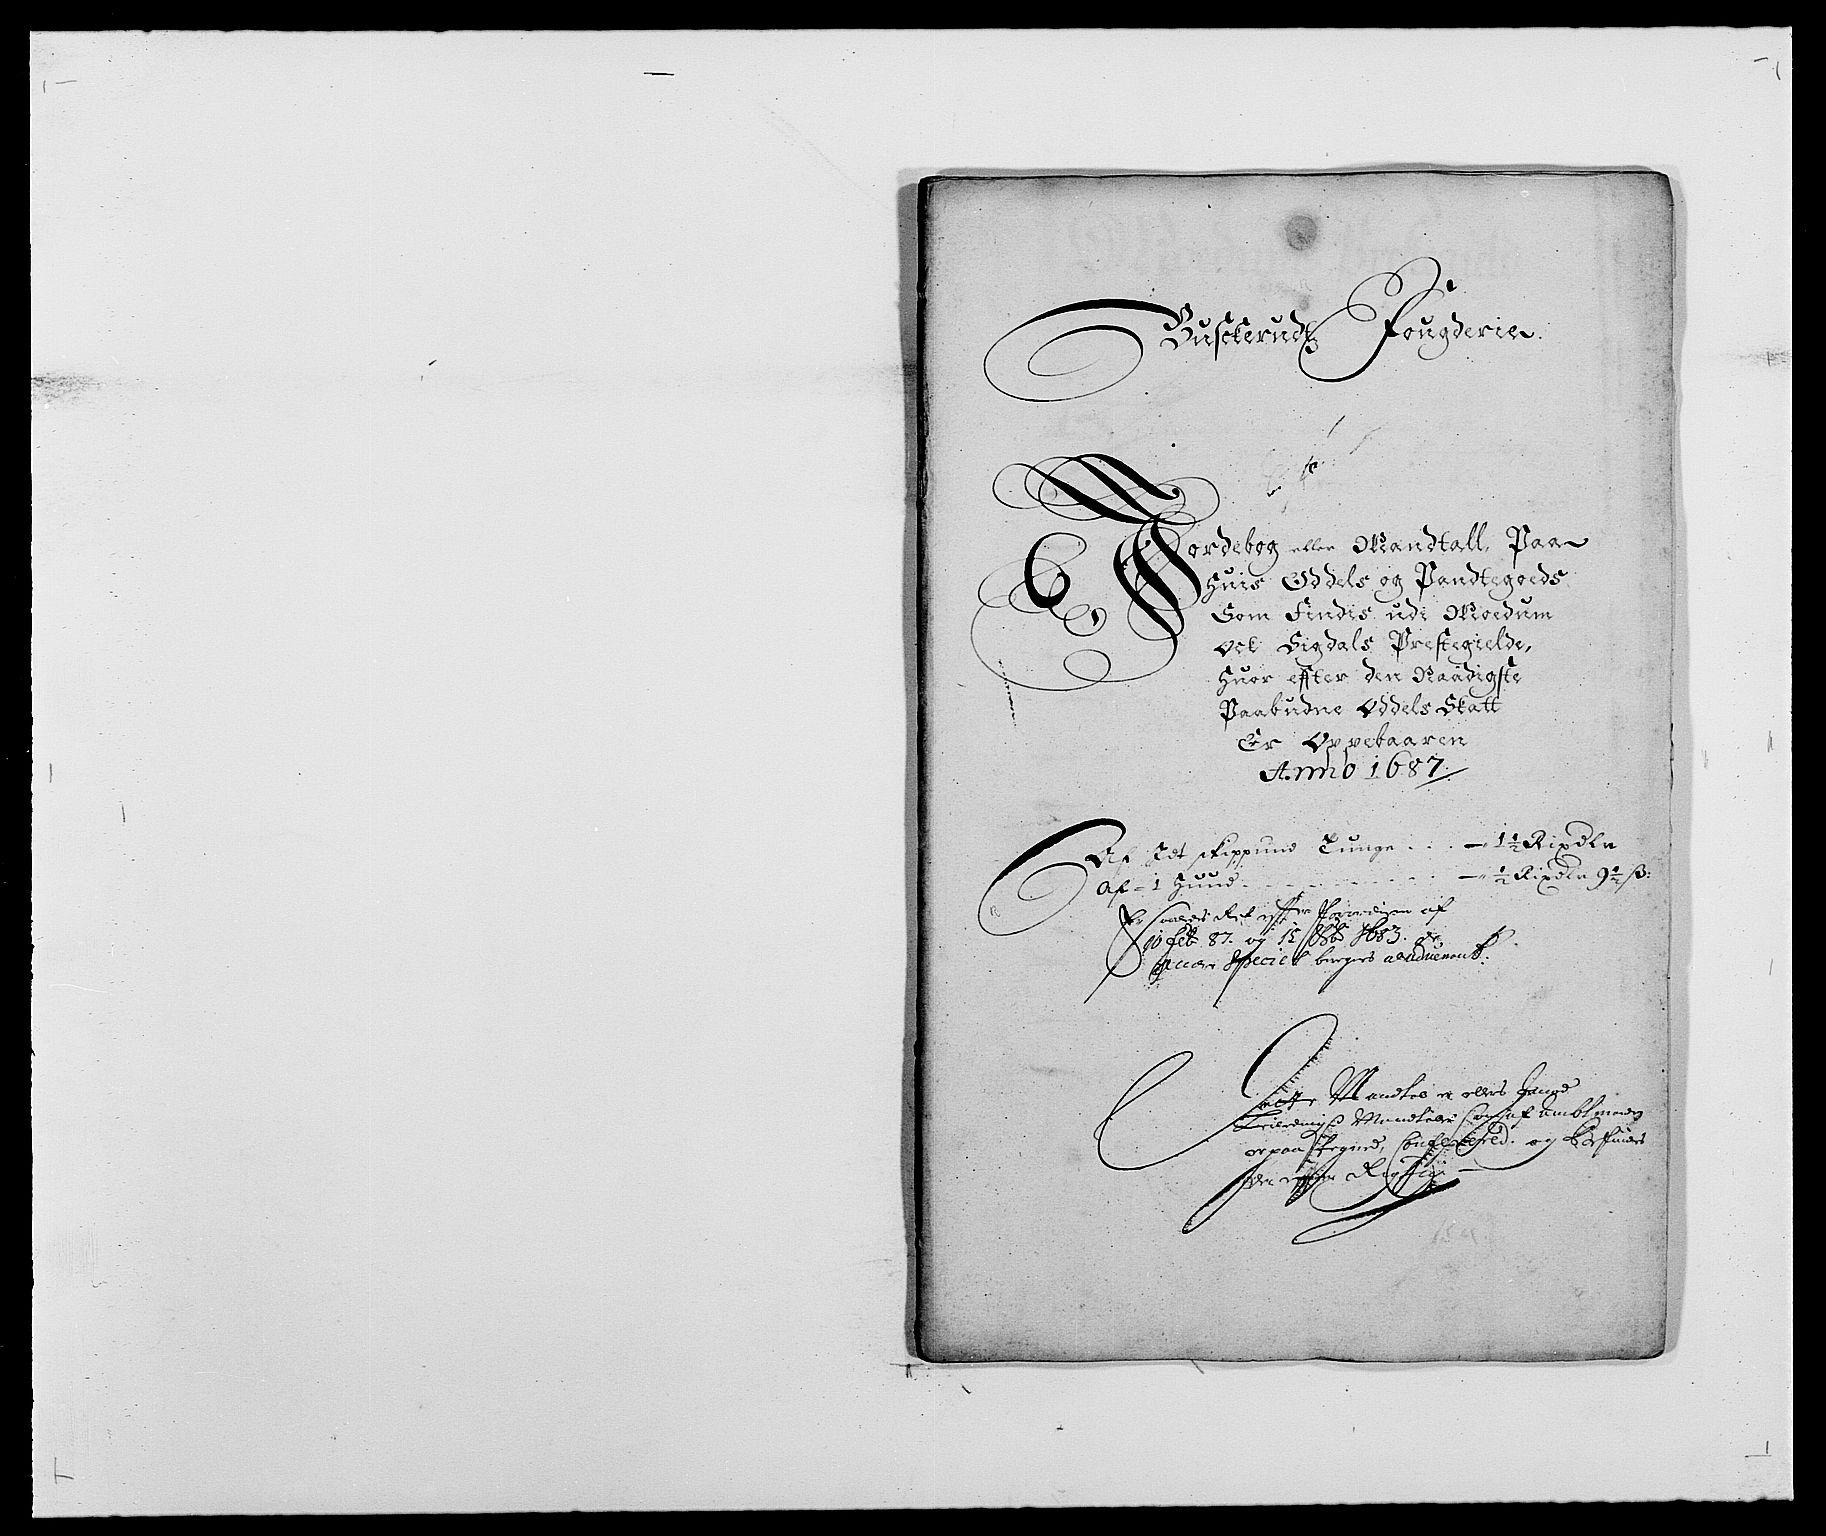 RA, Rentekammeret inntil 1814, Reviderte regnskaper, Fogderegnskap, R25/L1679: Fogderegnskap Buskerud, 1687-1688, s. 166